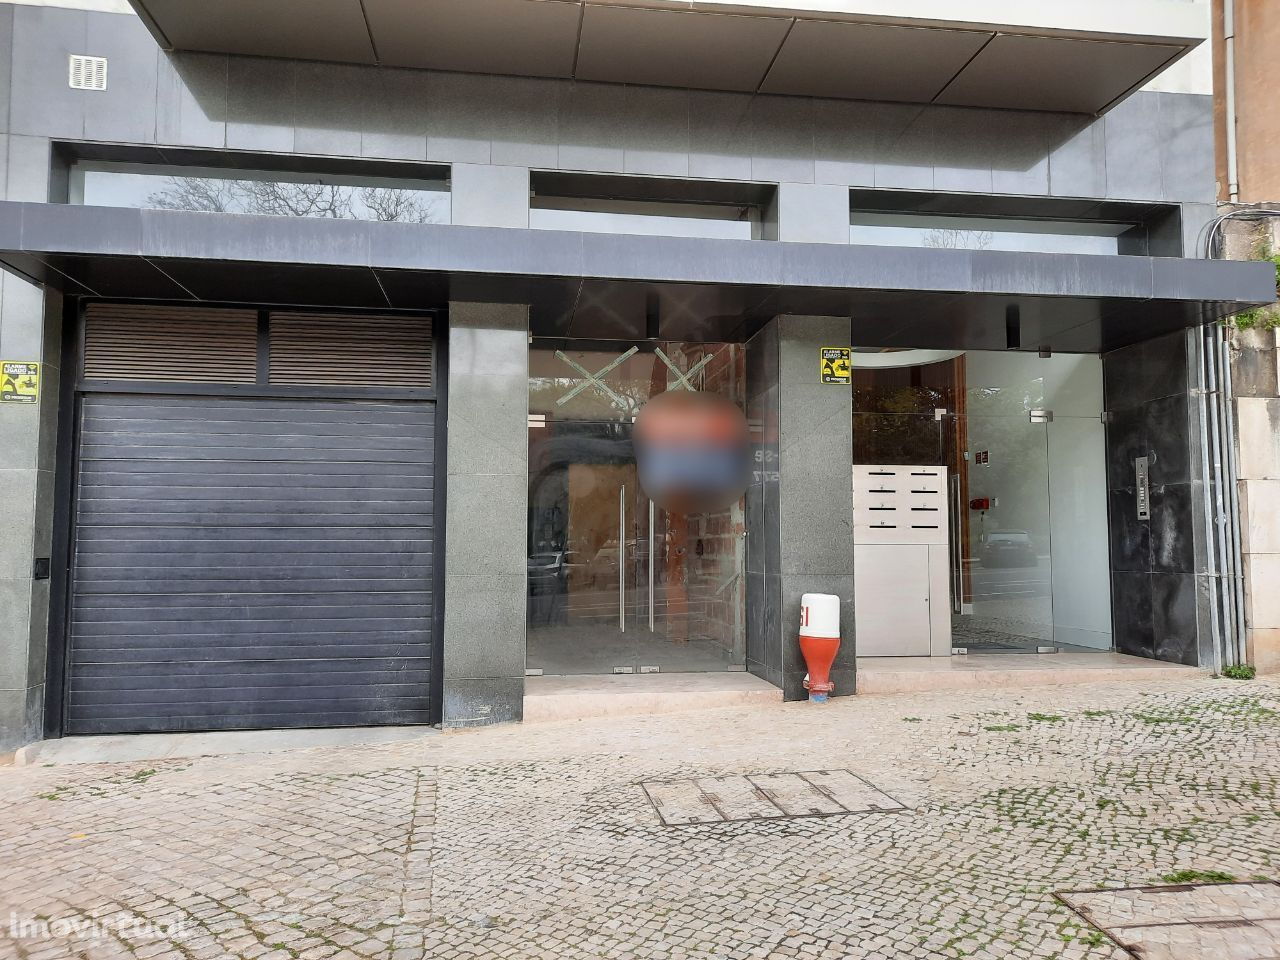 Arrendar Loja Lisboa | 465 m2 | Parque Ed. VII